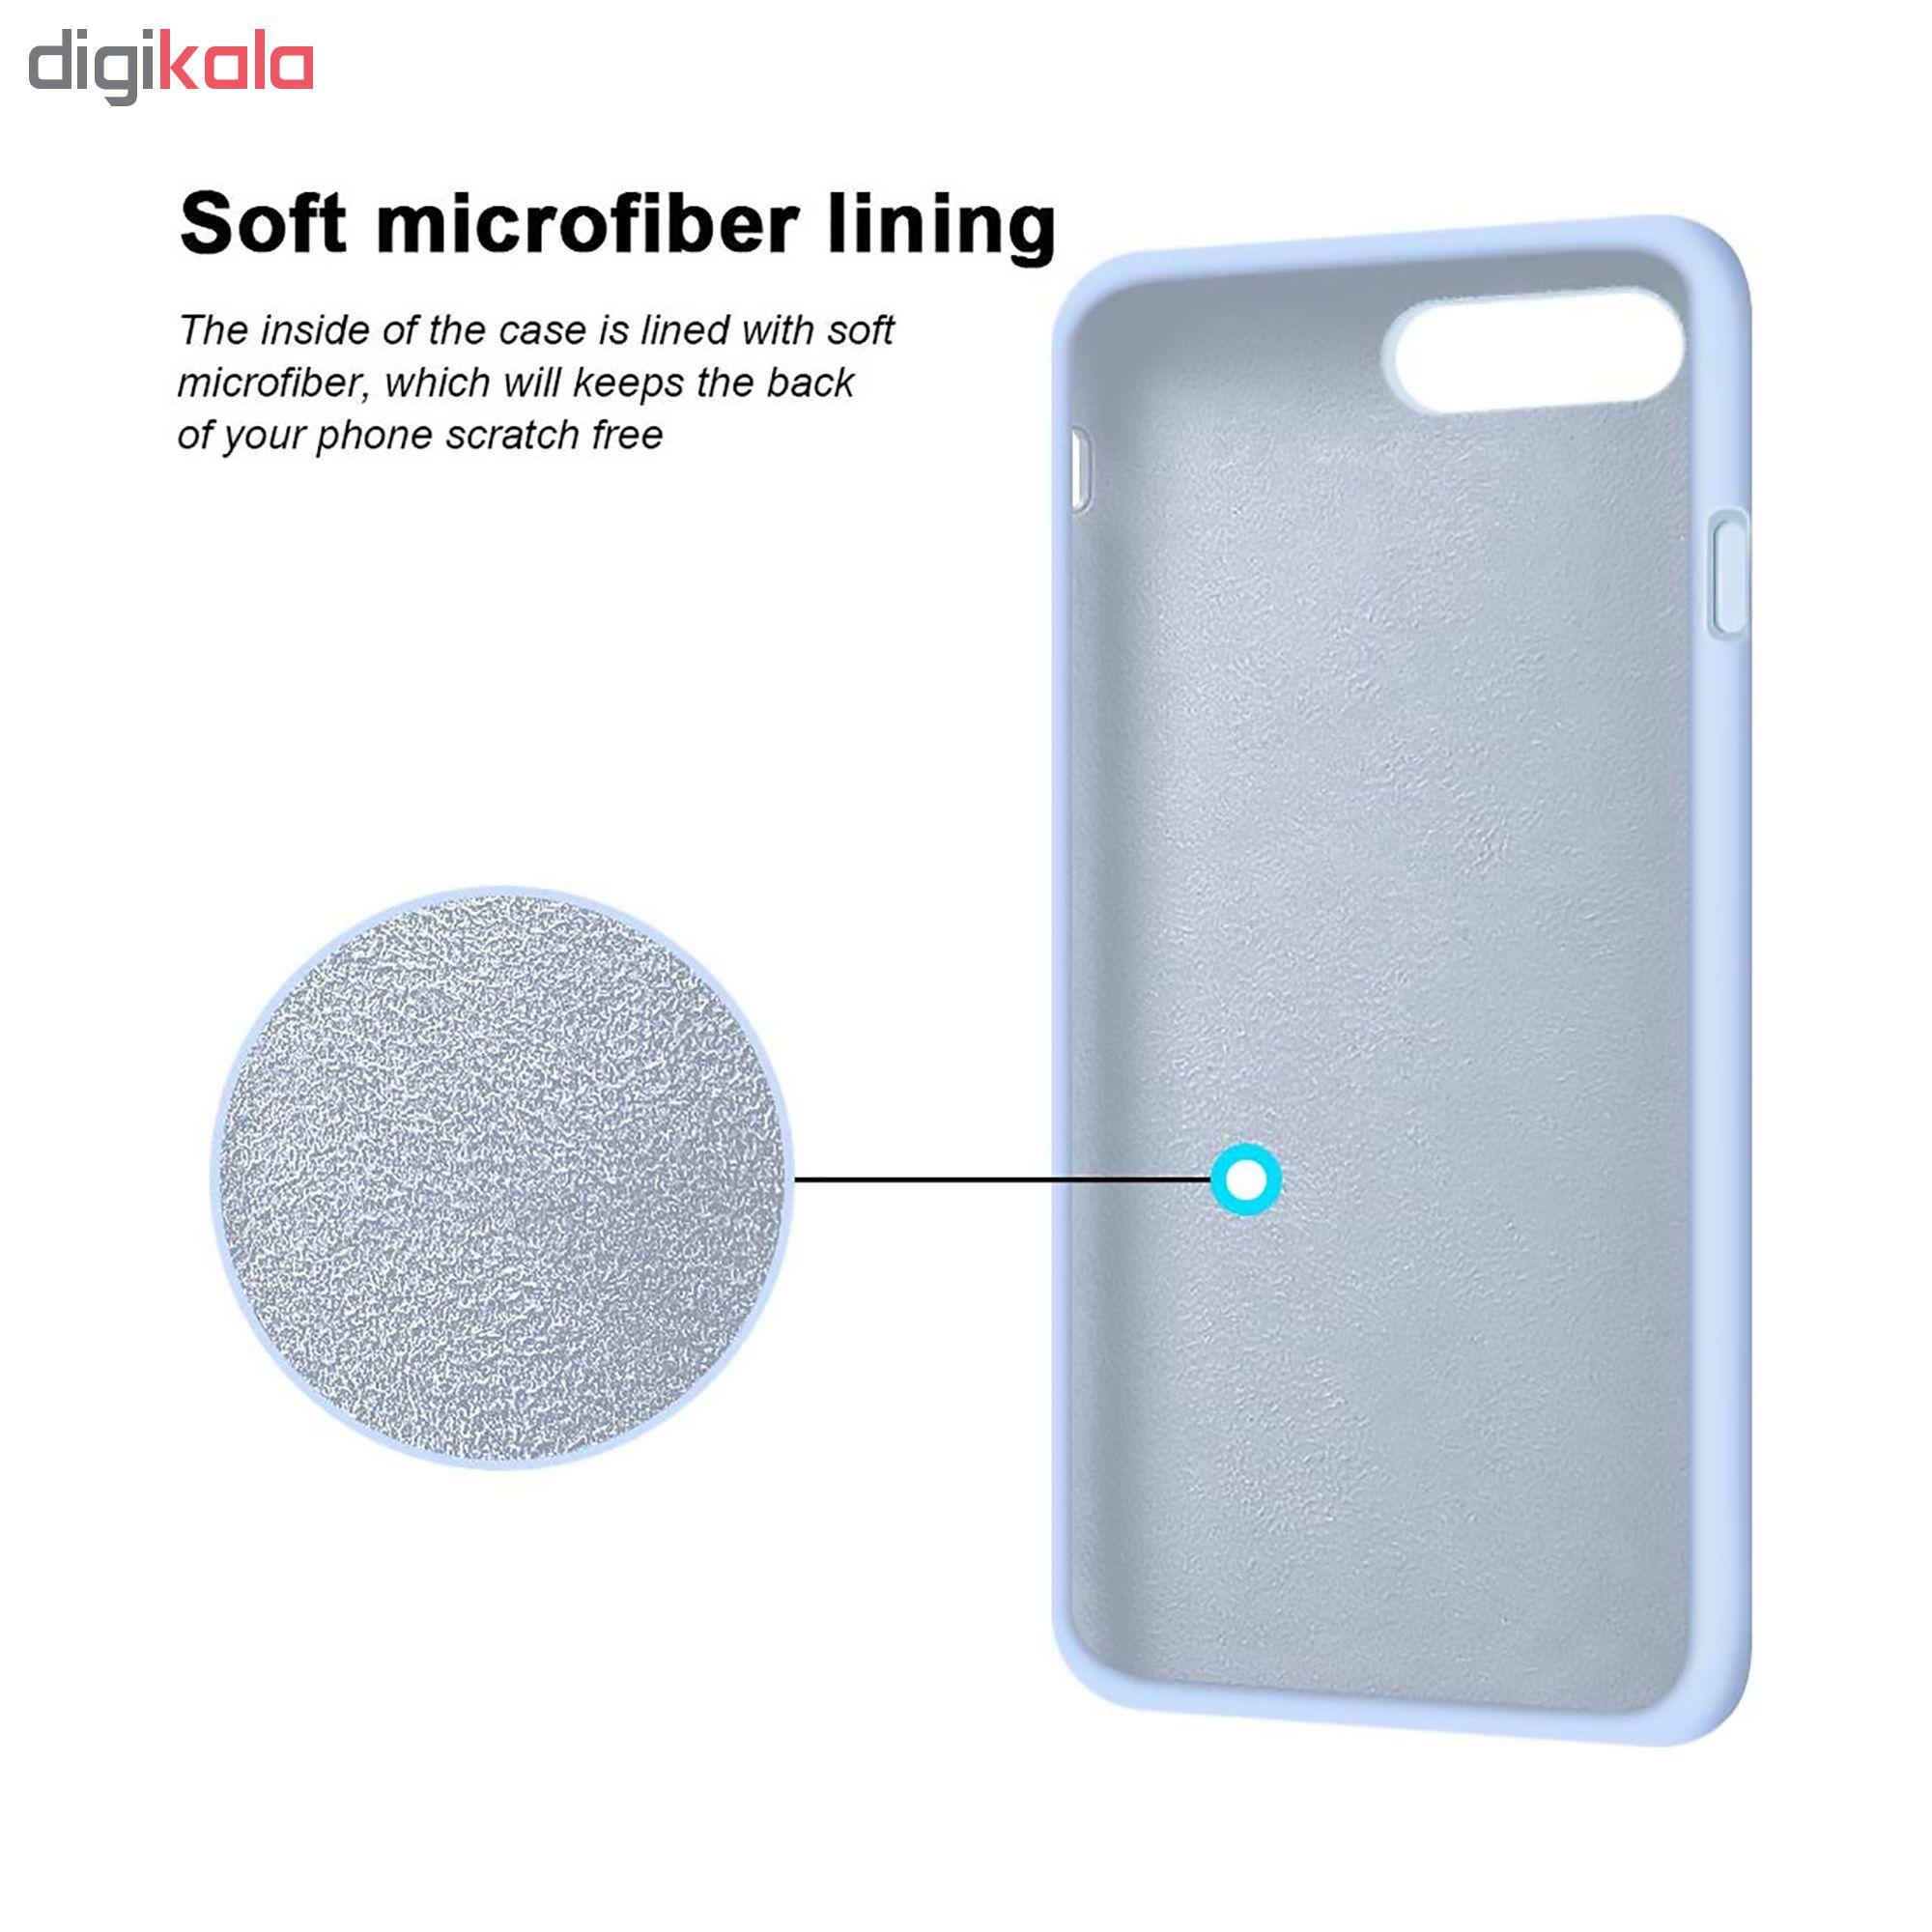 کاور مدل Silc مناسب برای گوشی موبایل اپل  Iphone 8 plus / iphone 7plus main 1 19